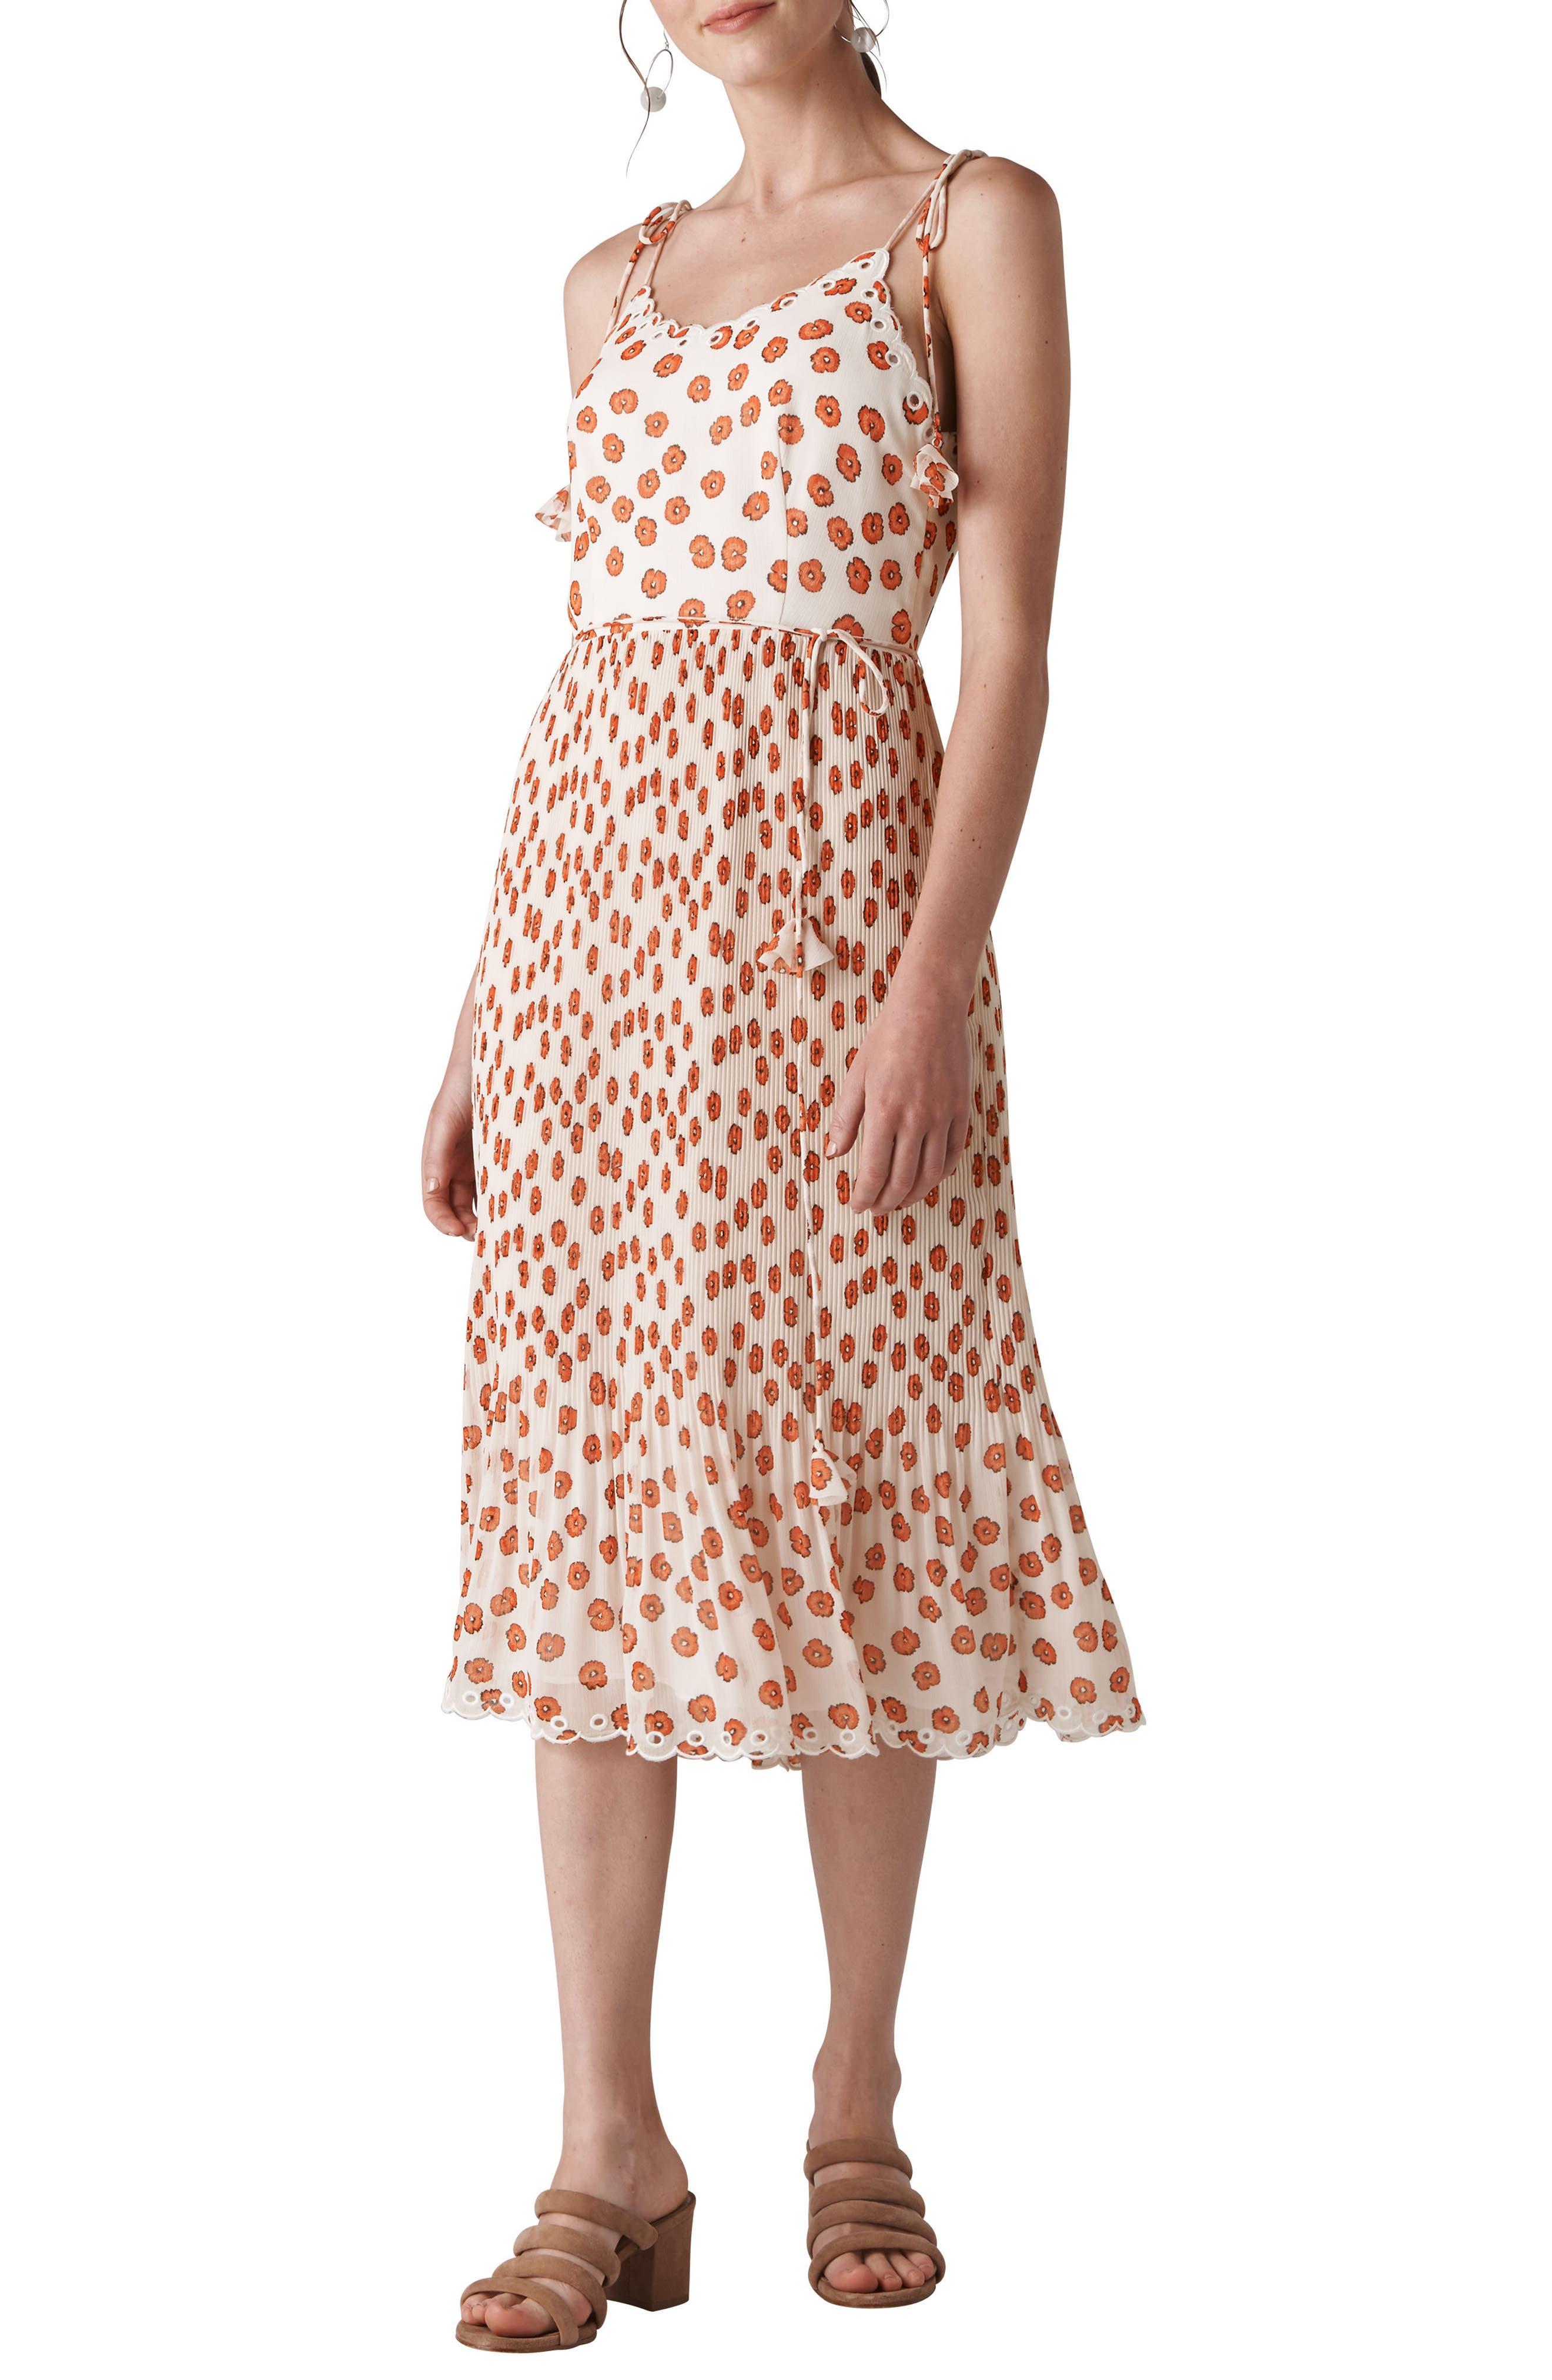 Salome Lenno Print Midi Dress,                             Main thumbnail 1, color,                             Multicolor